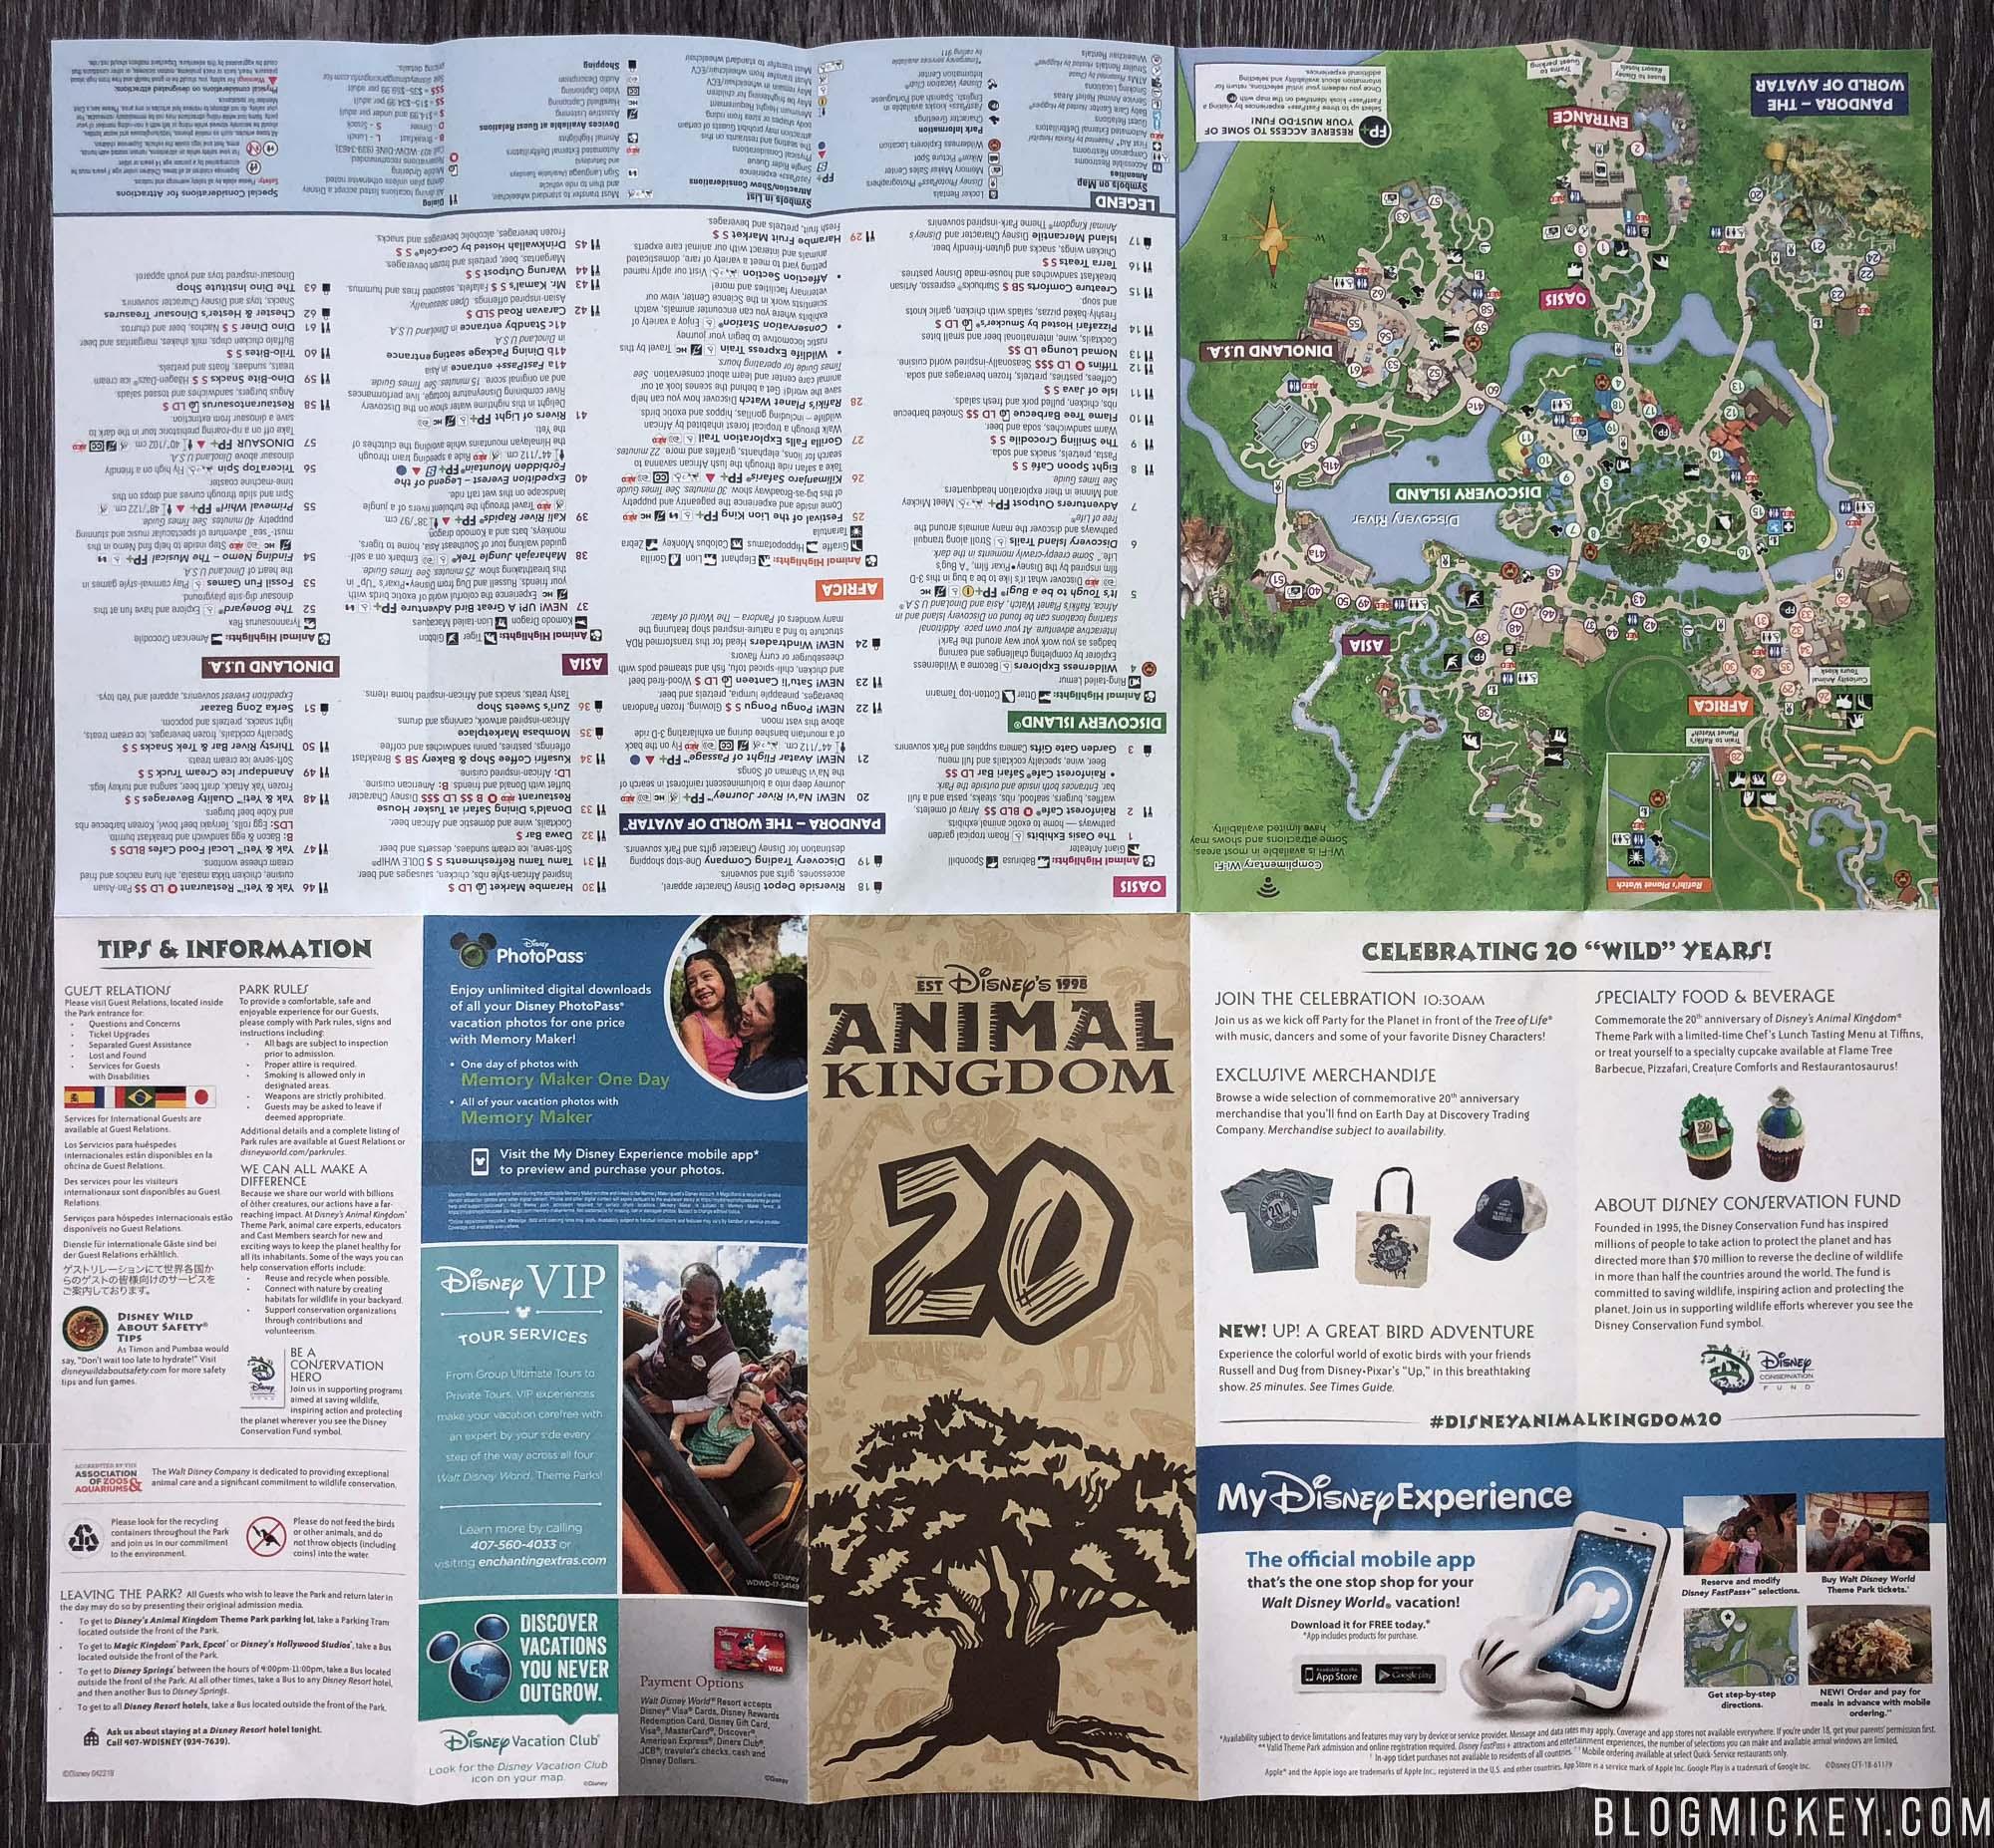 disneys-animal-kingdom-20th-anniversary-park-map-04222018-3 ...